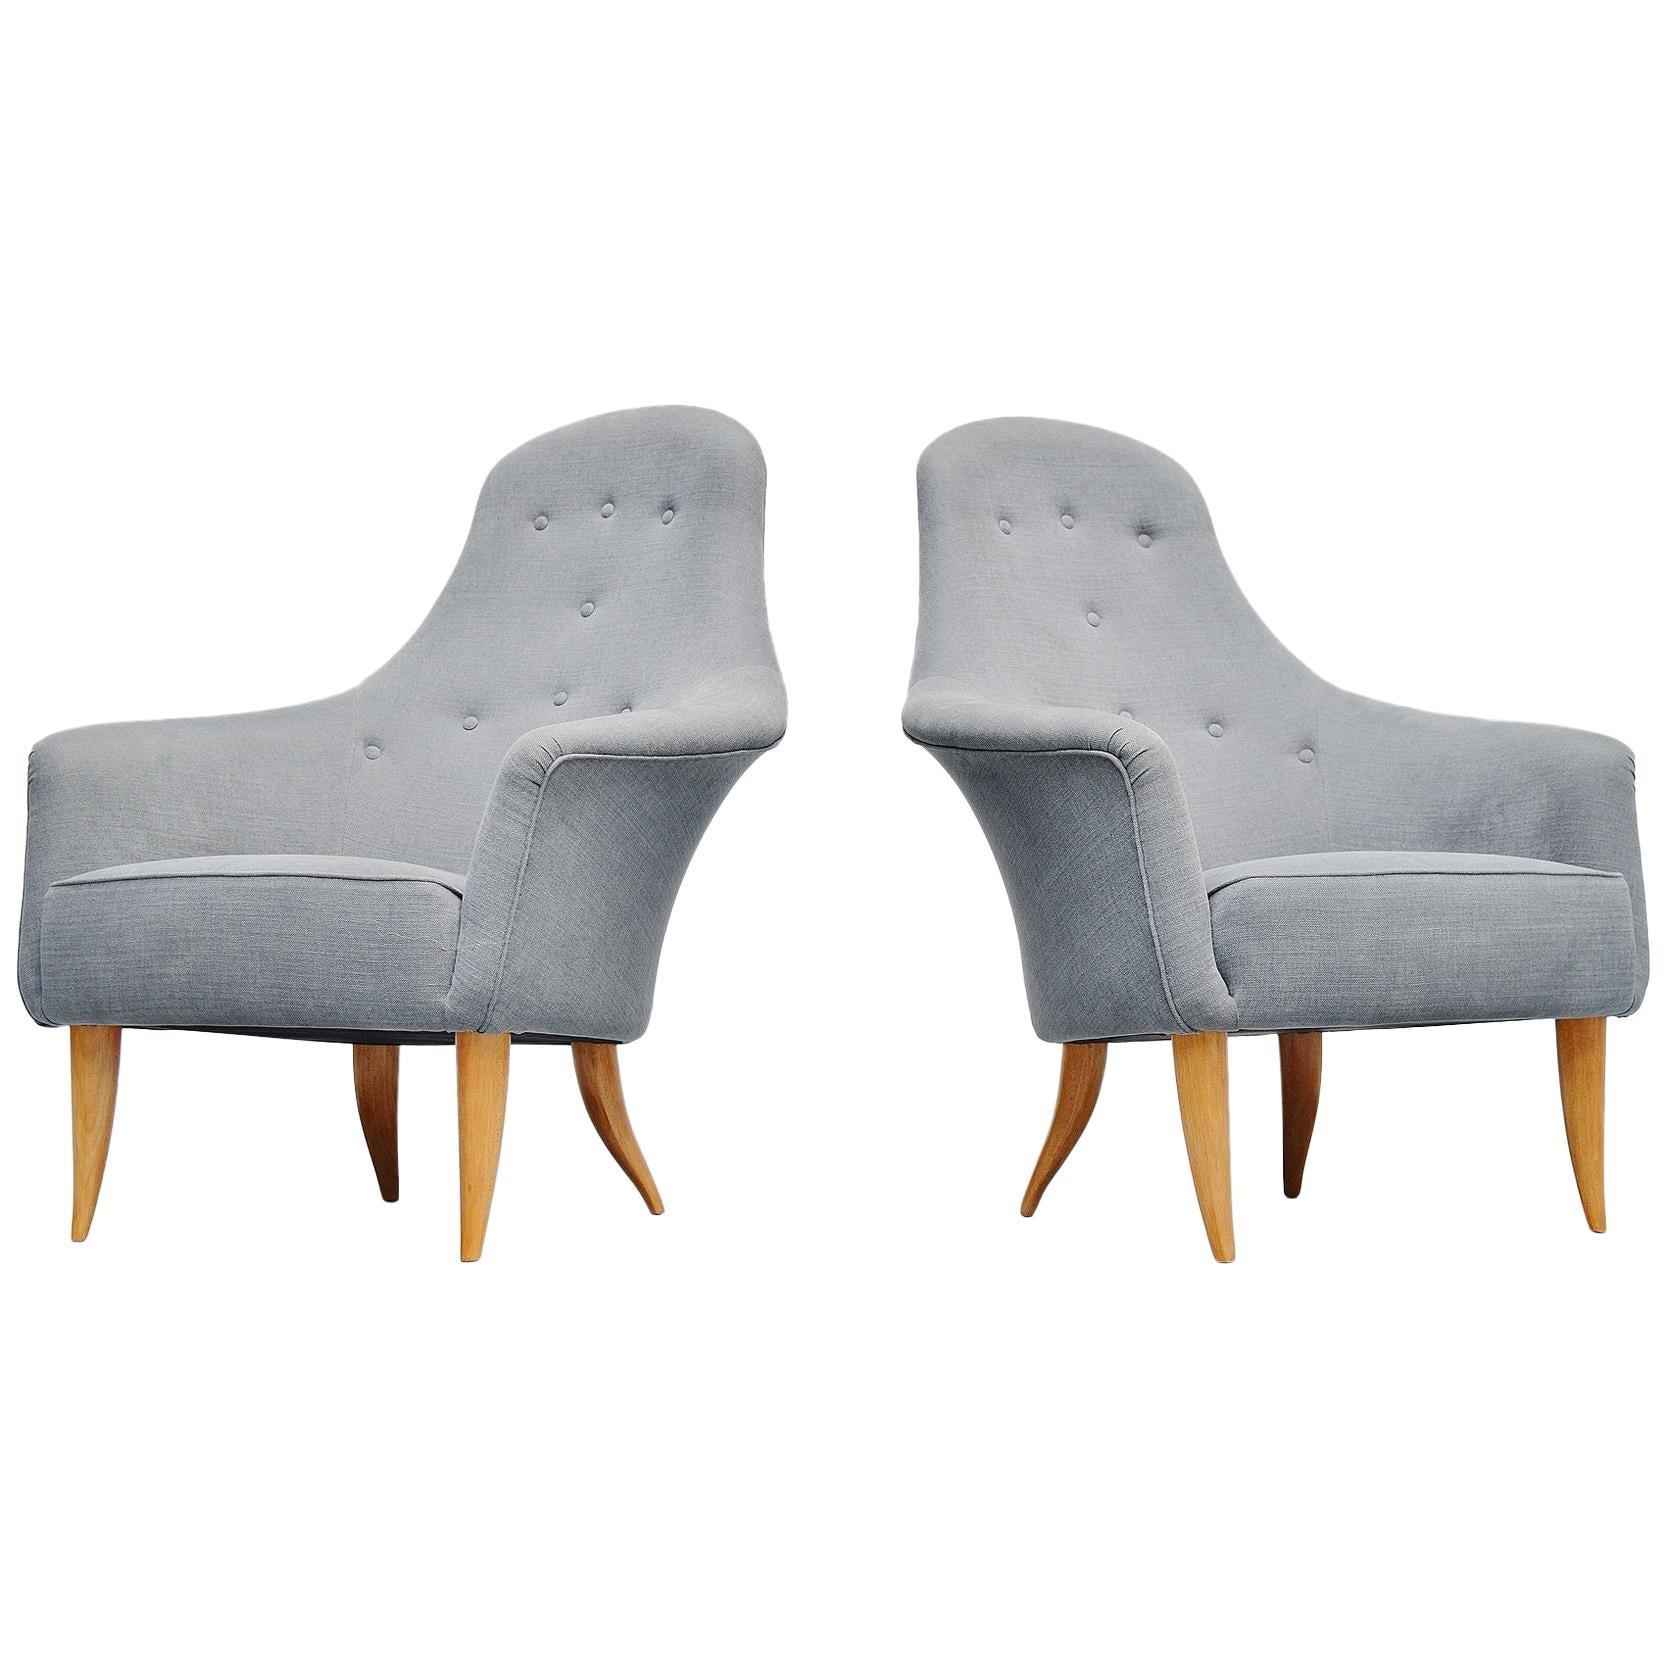 Kerstin Hörlin-Holmquist Adam Lounge Chairs Nordiska, 1958